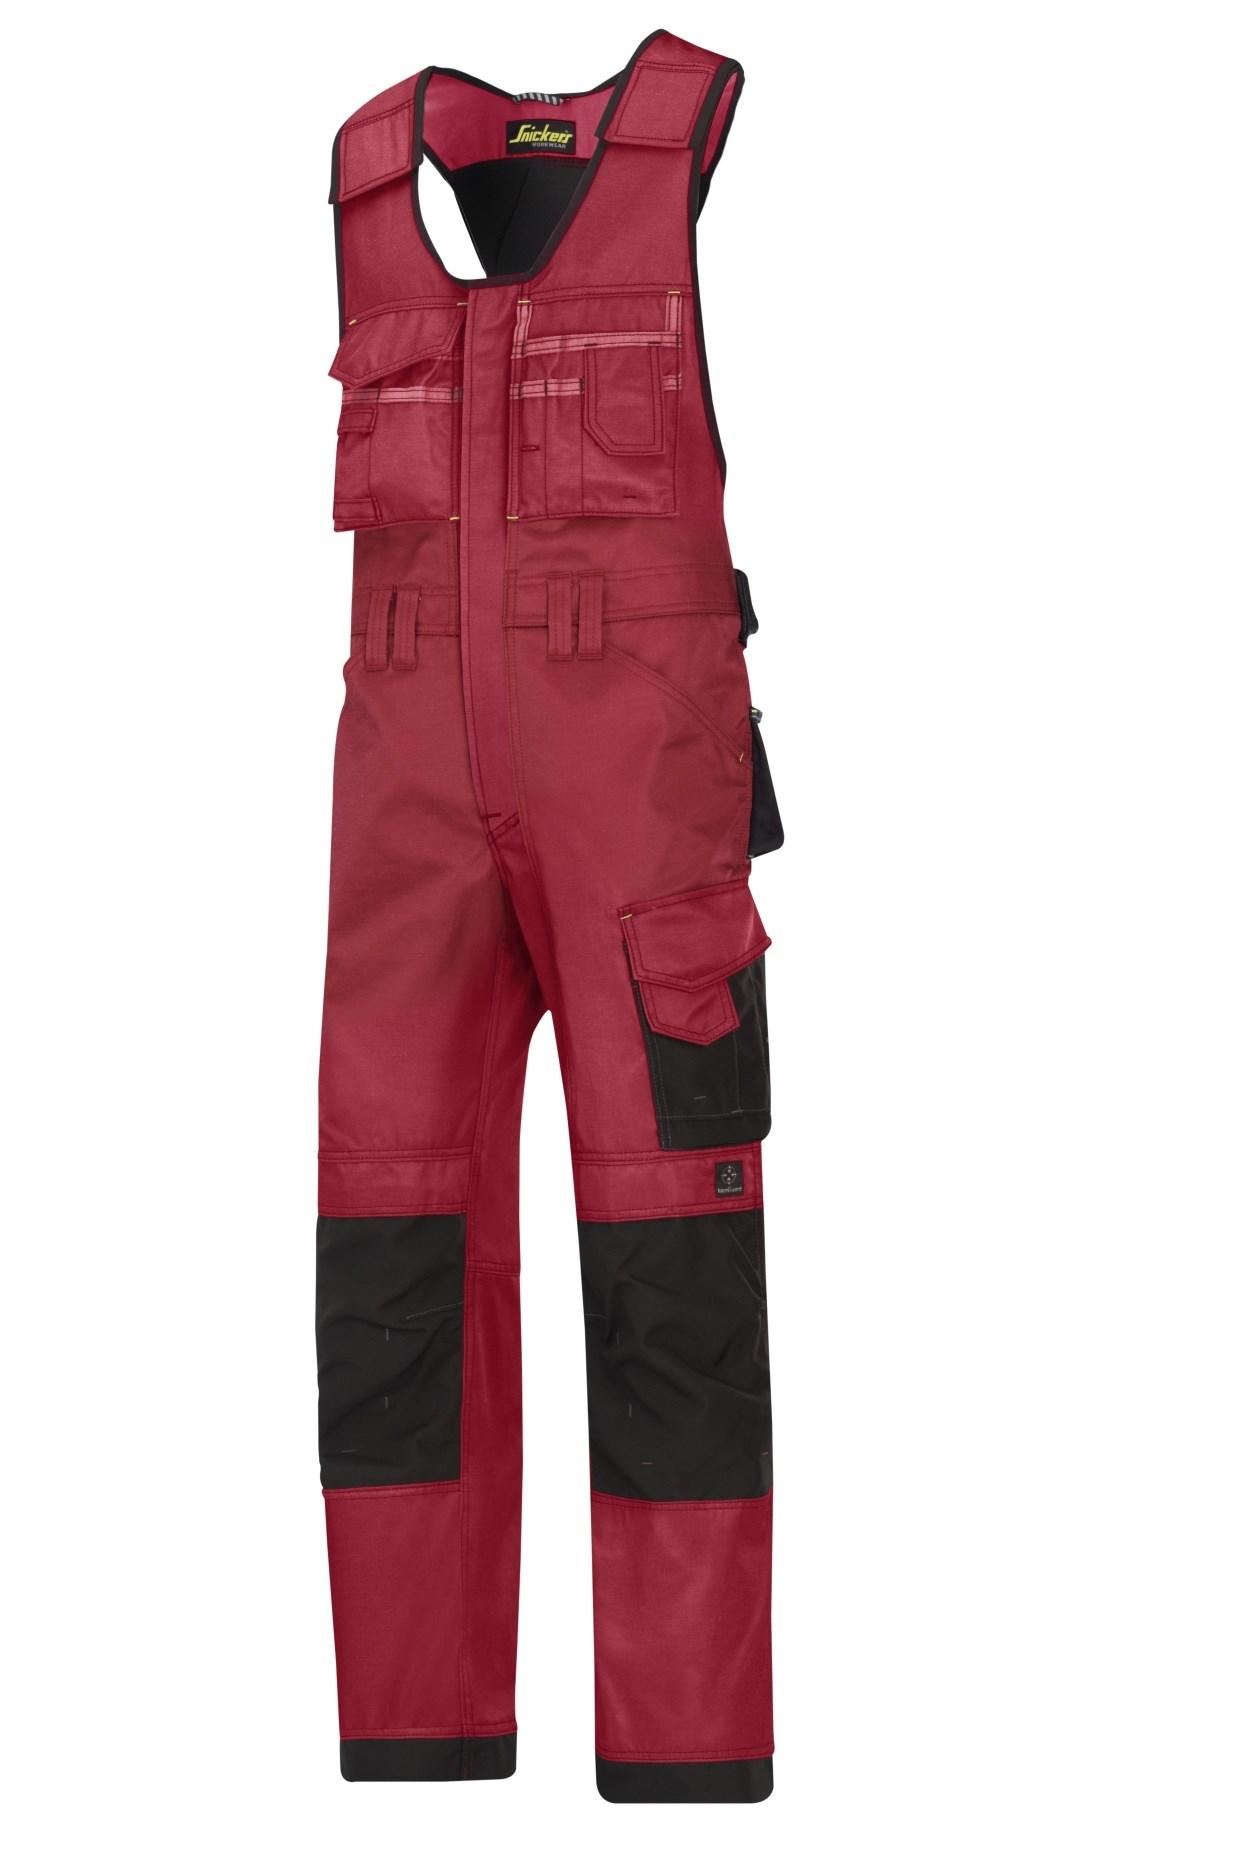 0312 helbukse snickers Workwear